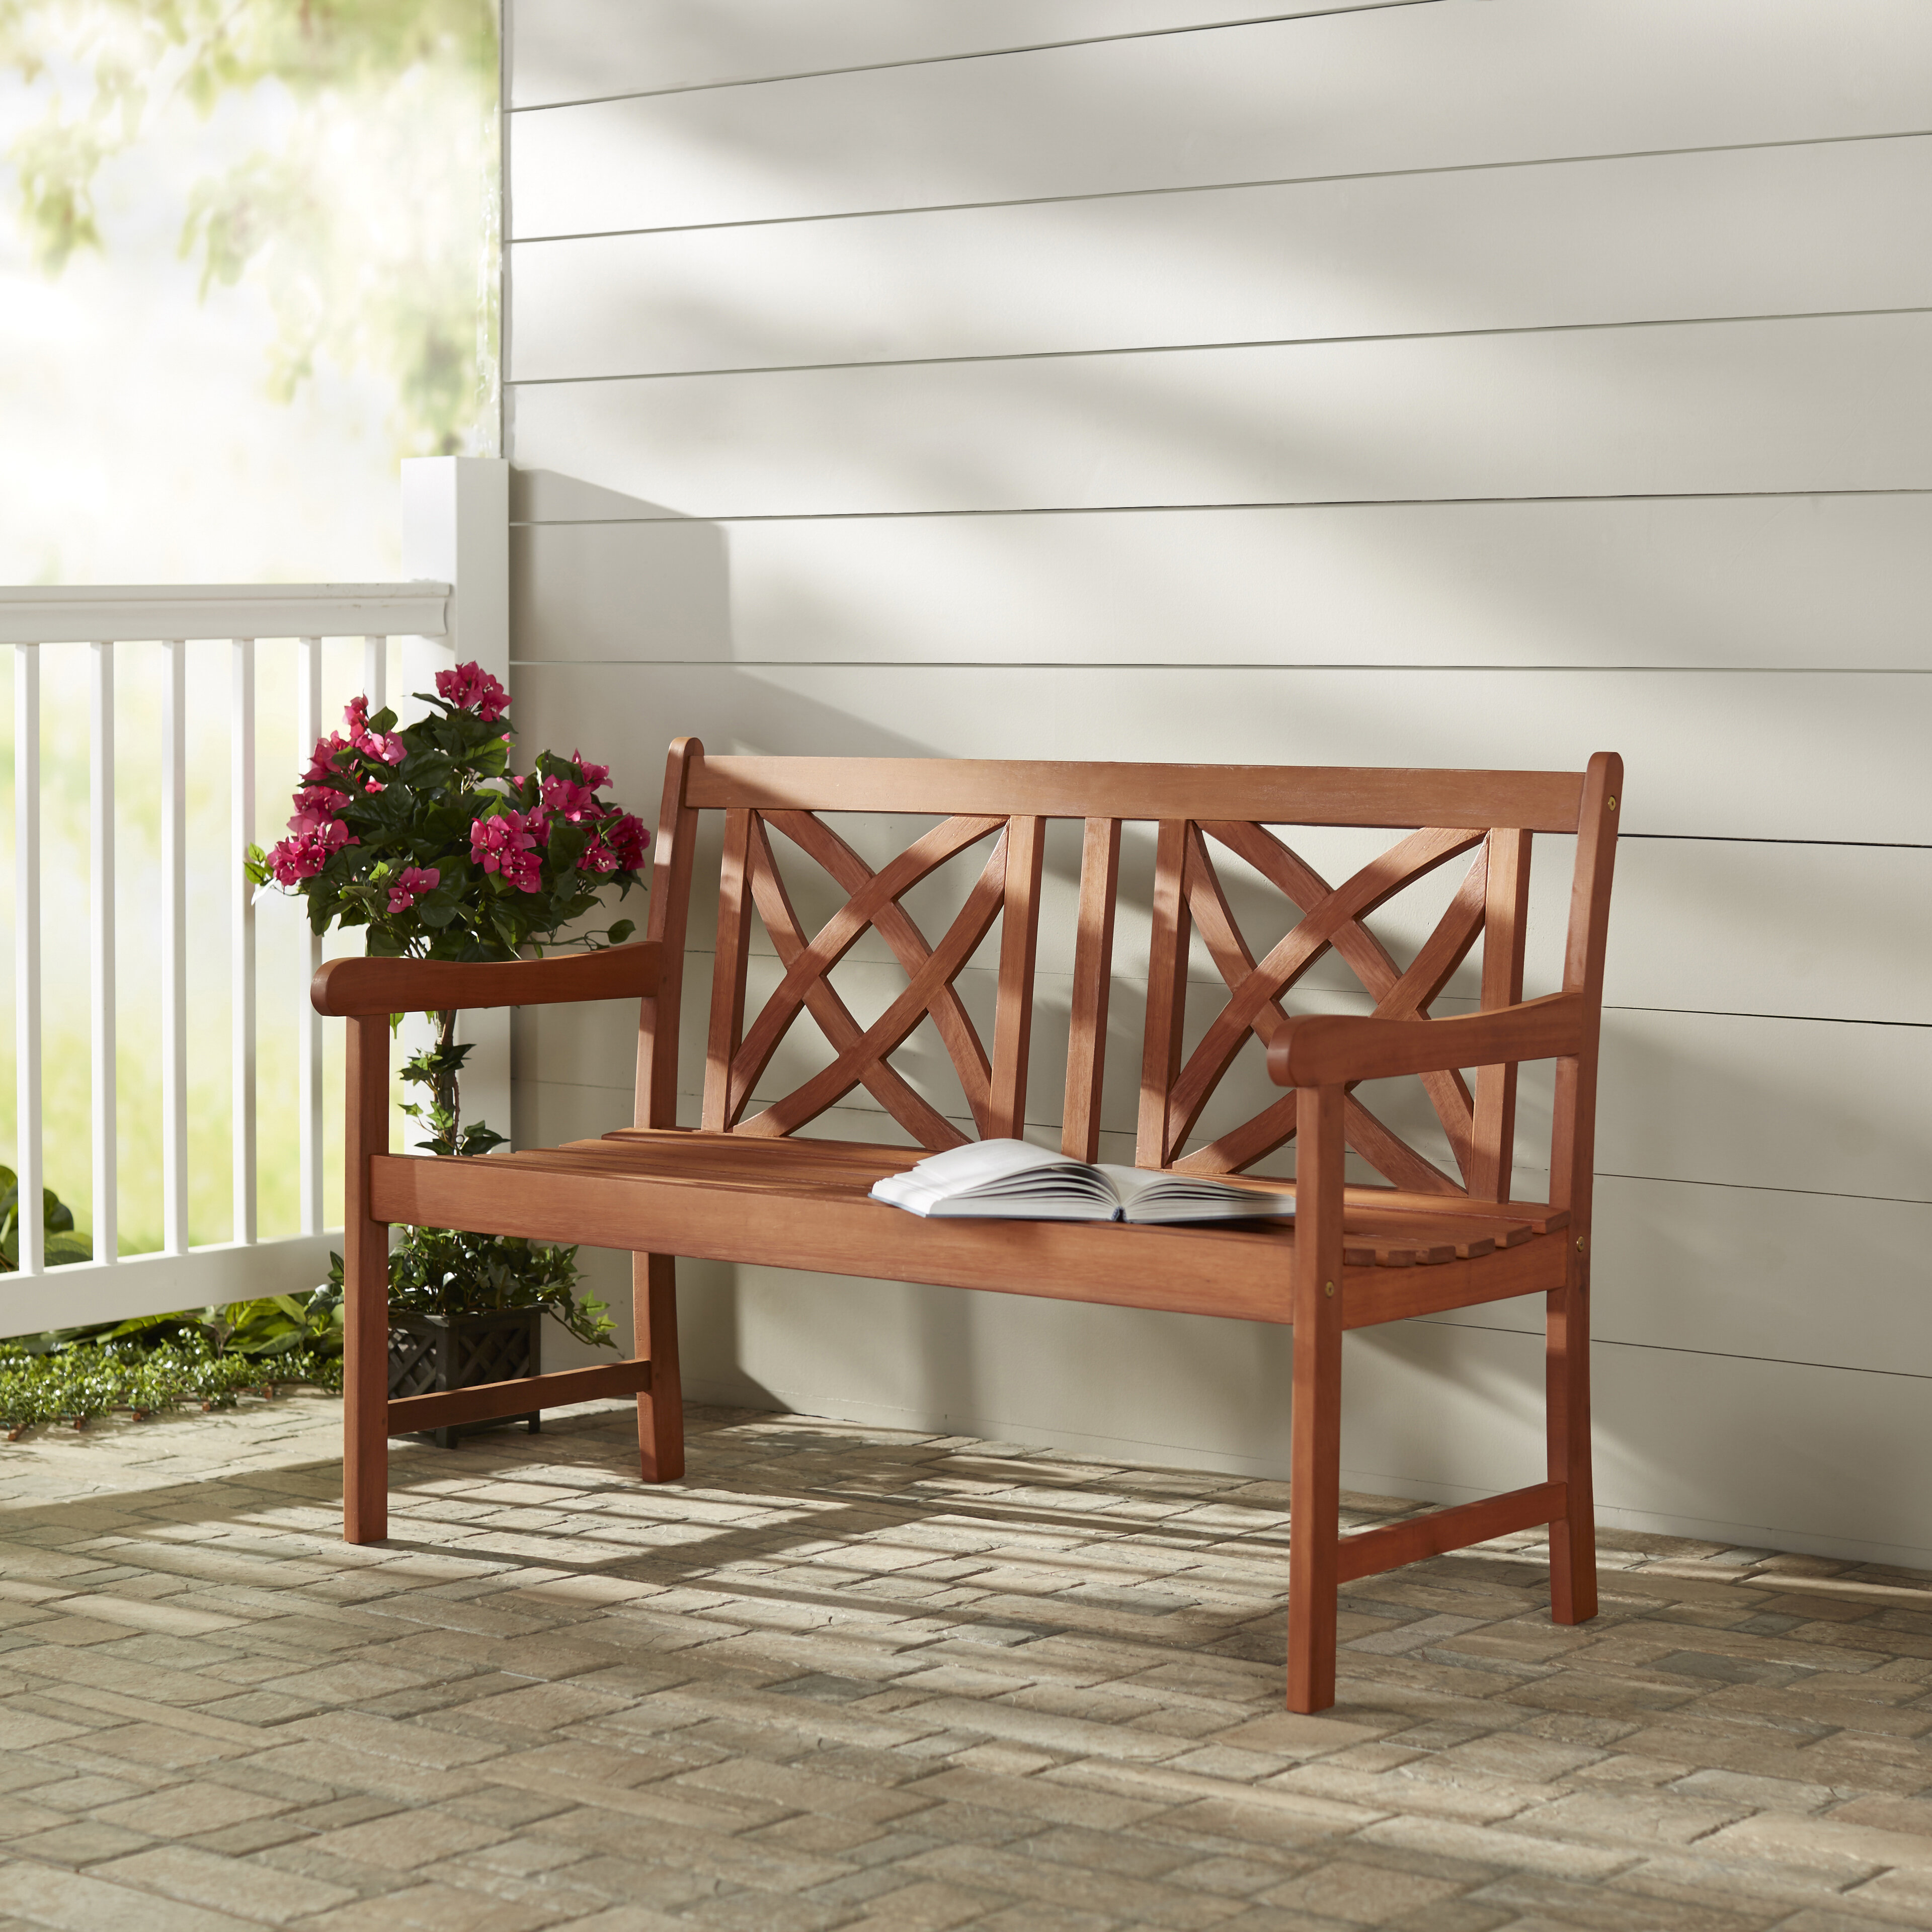 Charlton Home Blakeslee Wood Garden Bench & Reviews | Wayfair